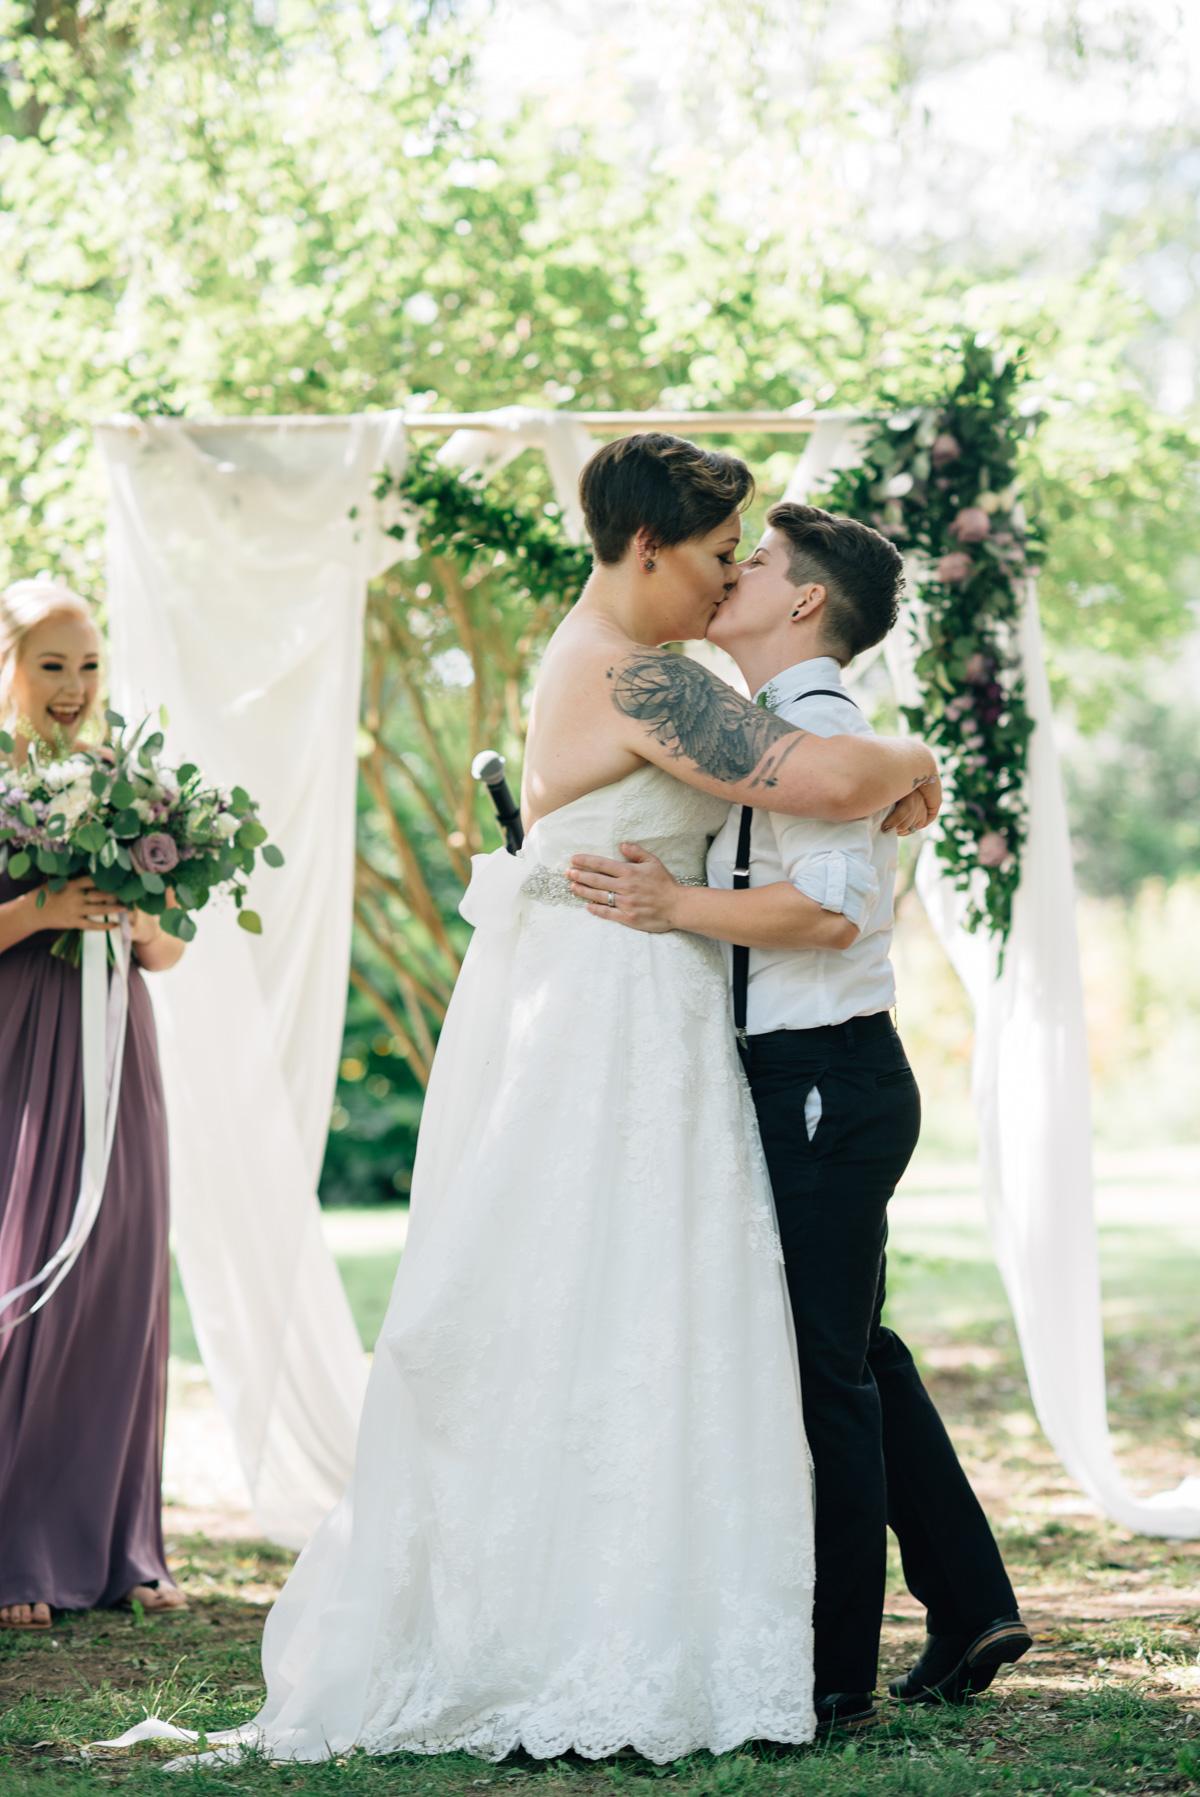 sara-wilde-photography-vineyard-bride-swish-list-beamer-falls-manor-grimsby-wedding-30.jpg